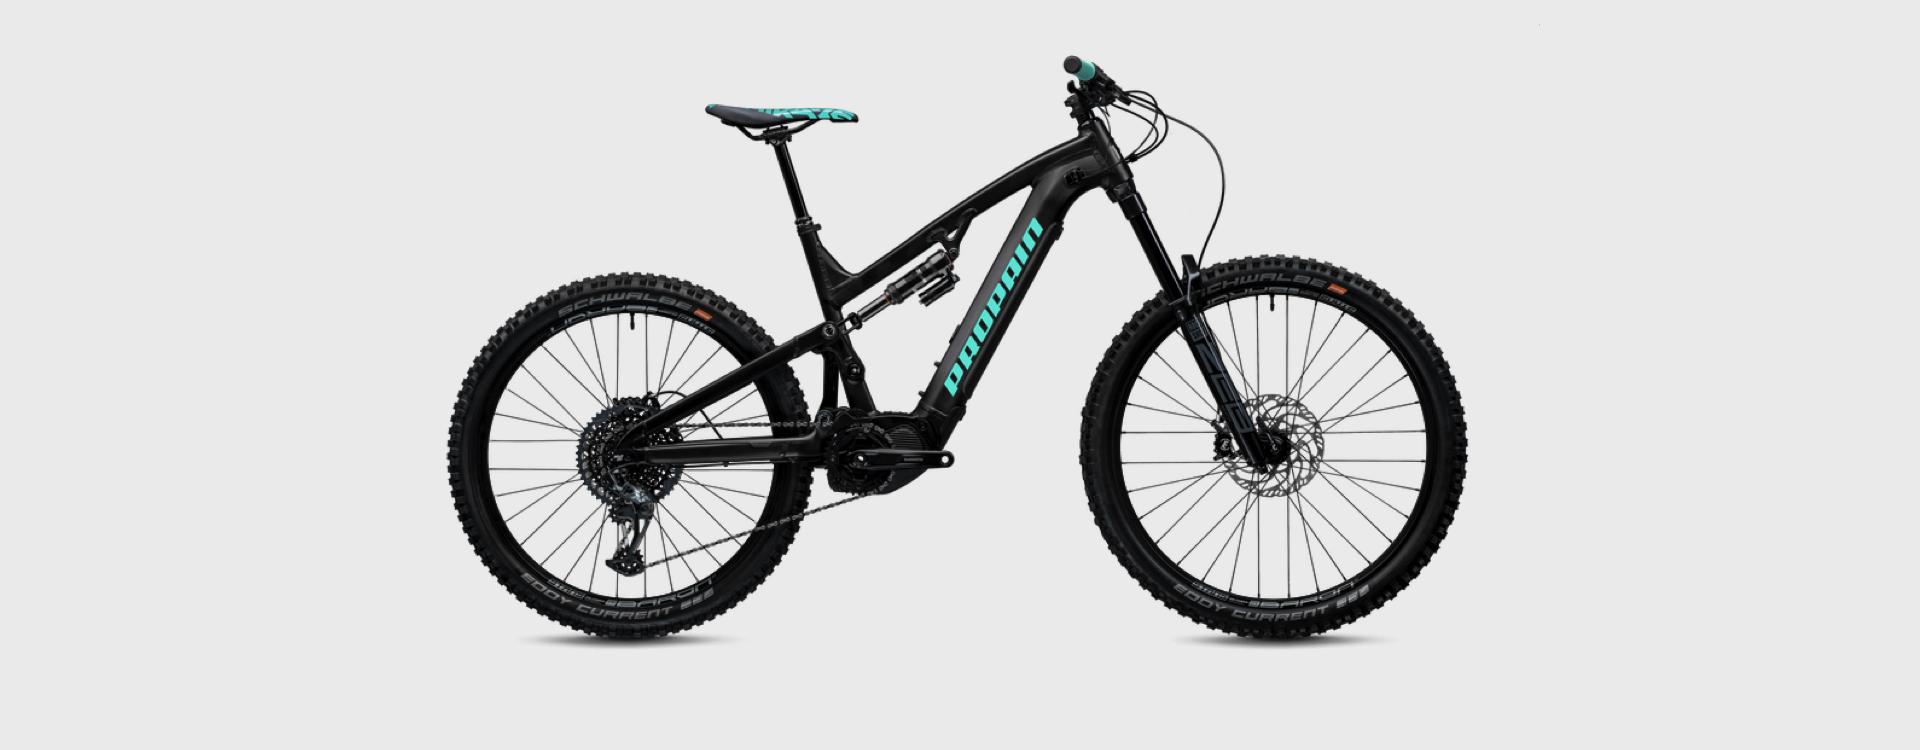 Bike Verleih Gummersbach Propain Bikes Testcenter NRW Ekano 4 - AL - M - Mix - Black - 1920x750